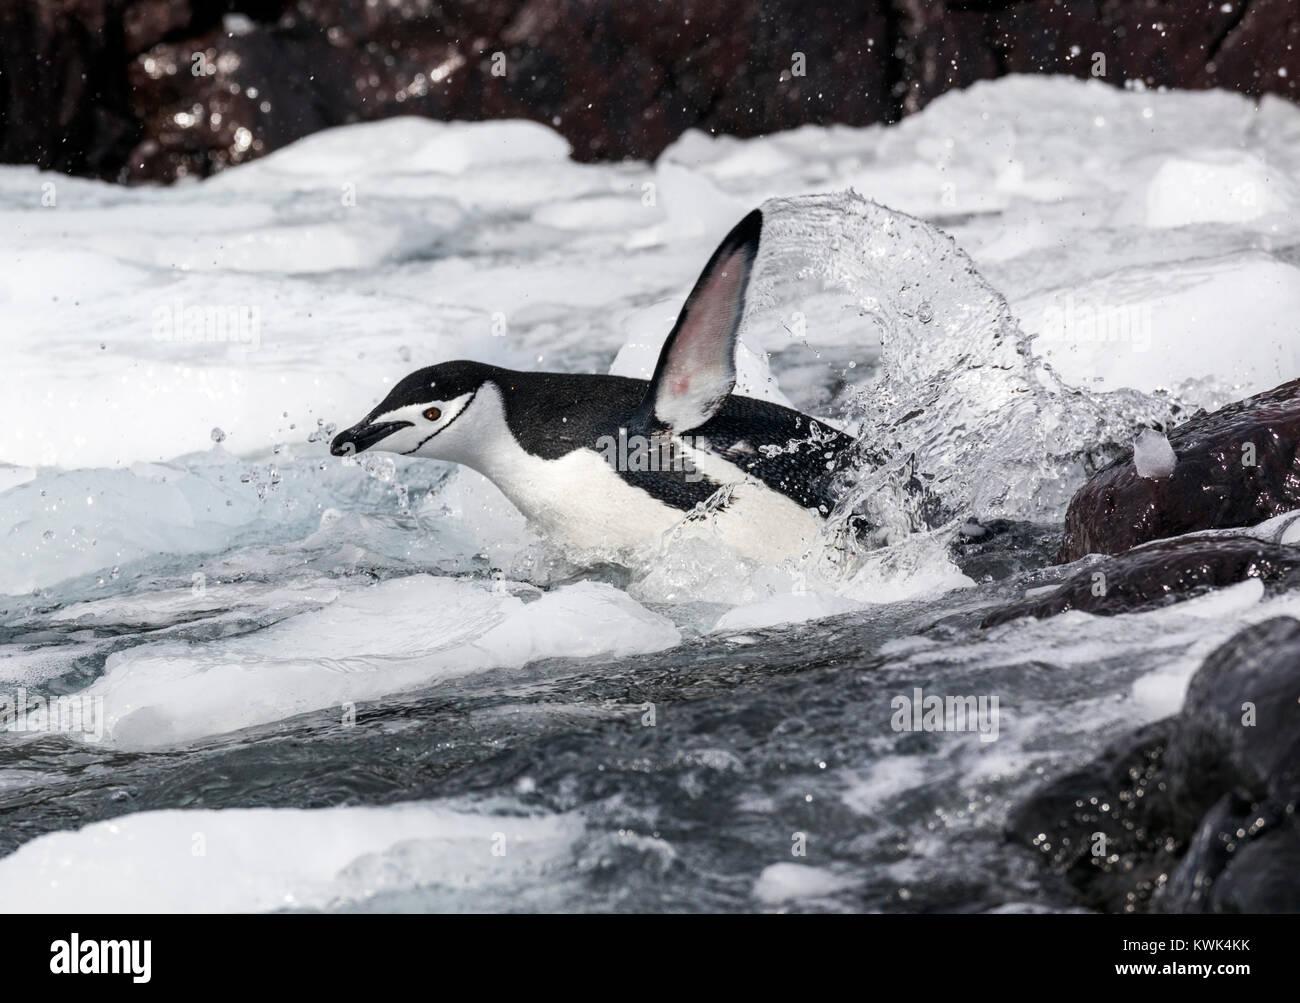 Natación; pingüinos de barbijo (Pygoscelis antarcticus; anillado; pingüinos pingüino barbudo; Imagen De Stock